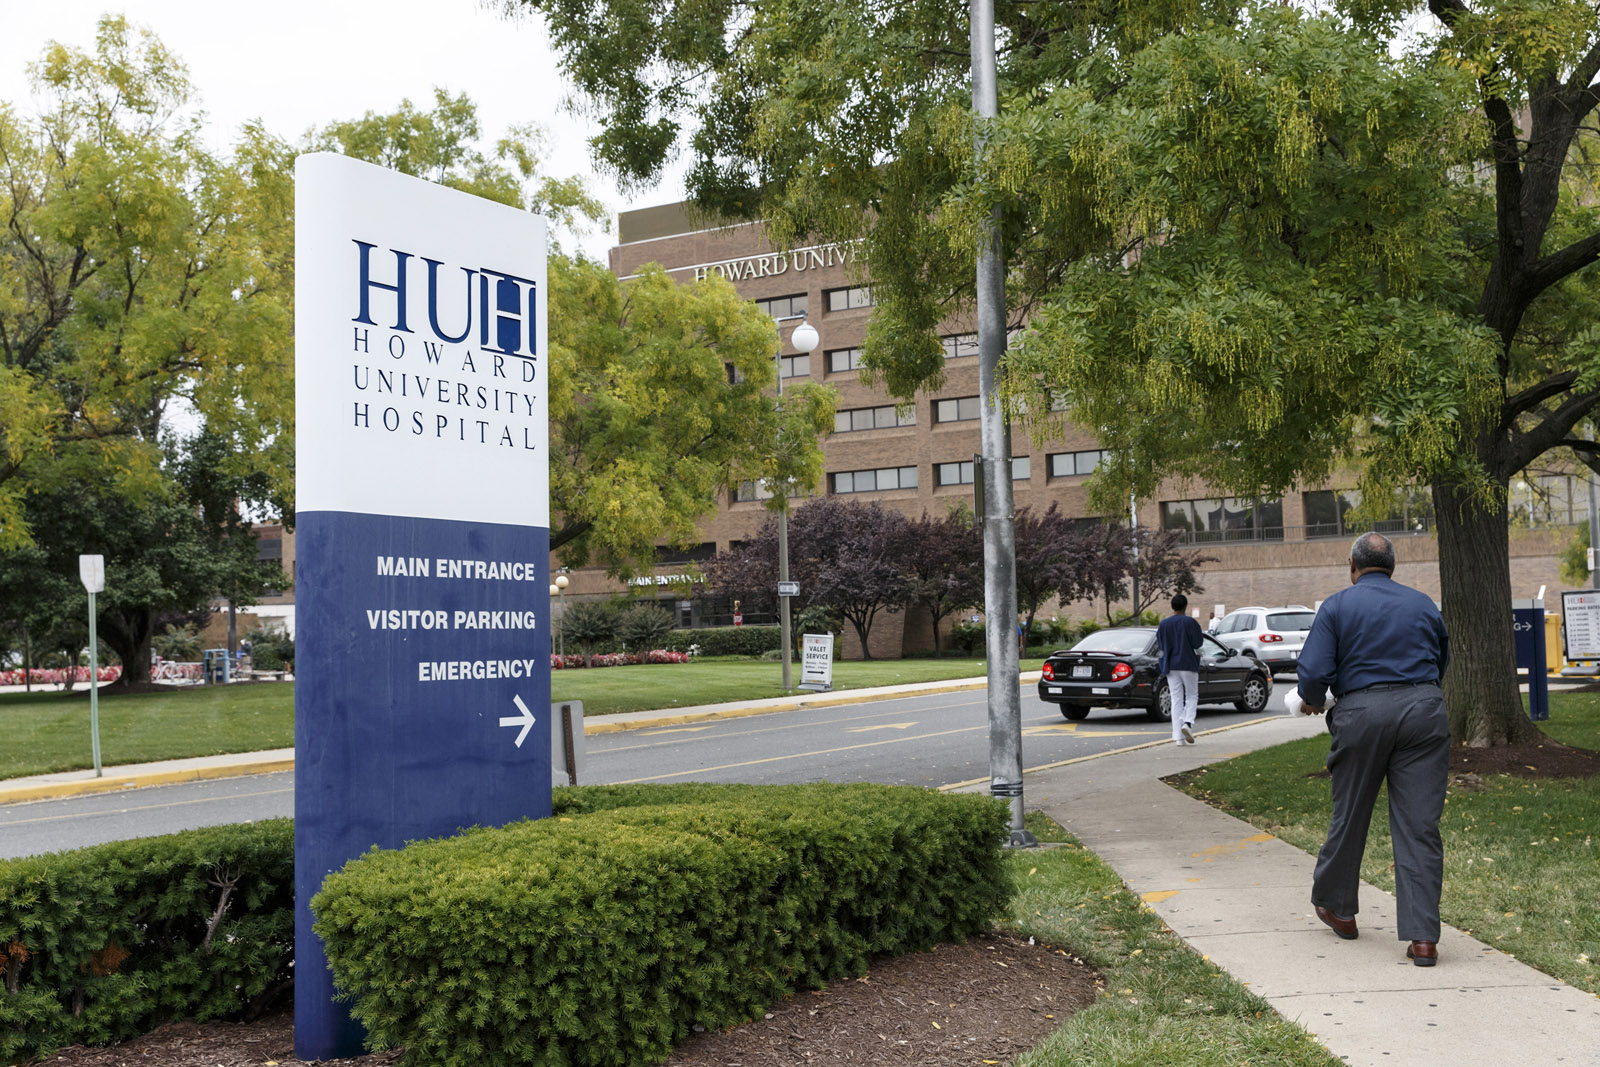 Water service restored at Howard University Hospital